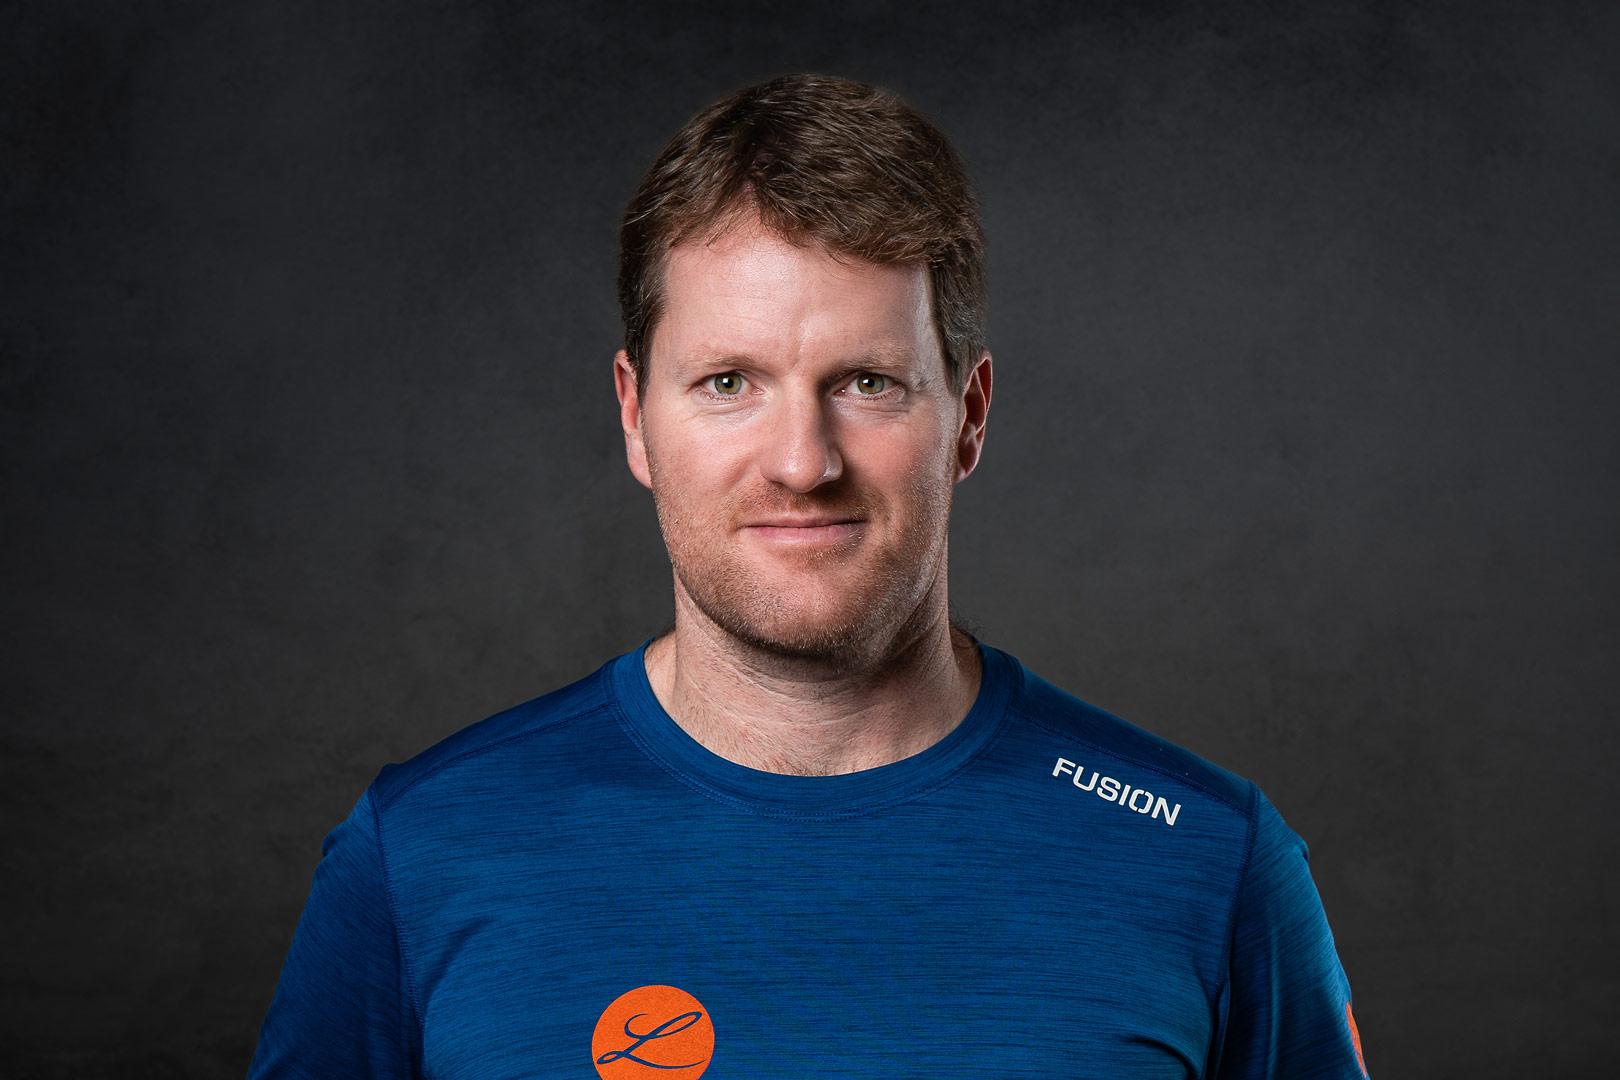 Daniel Tietze